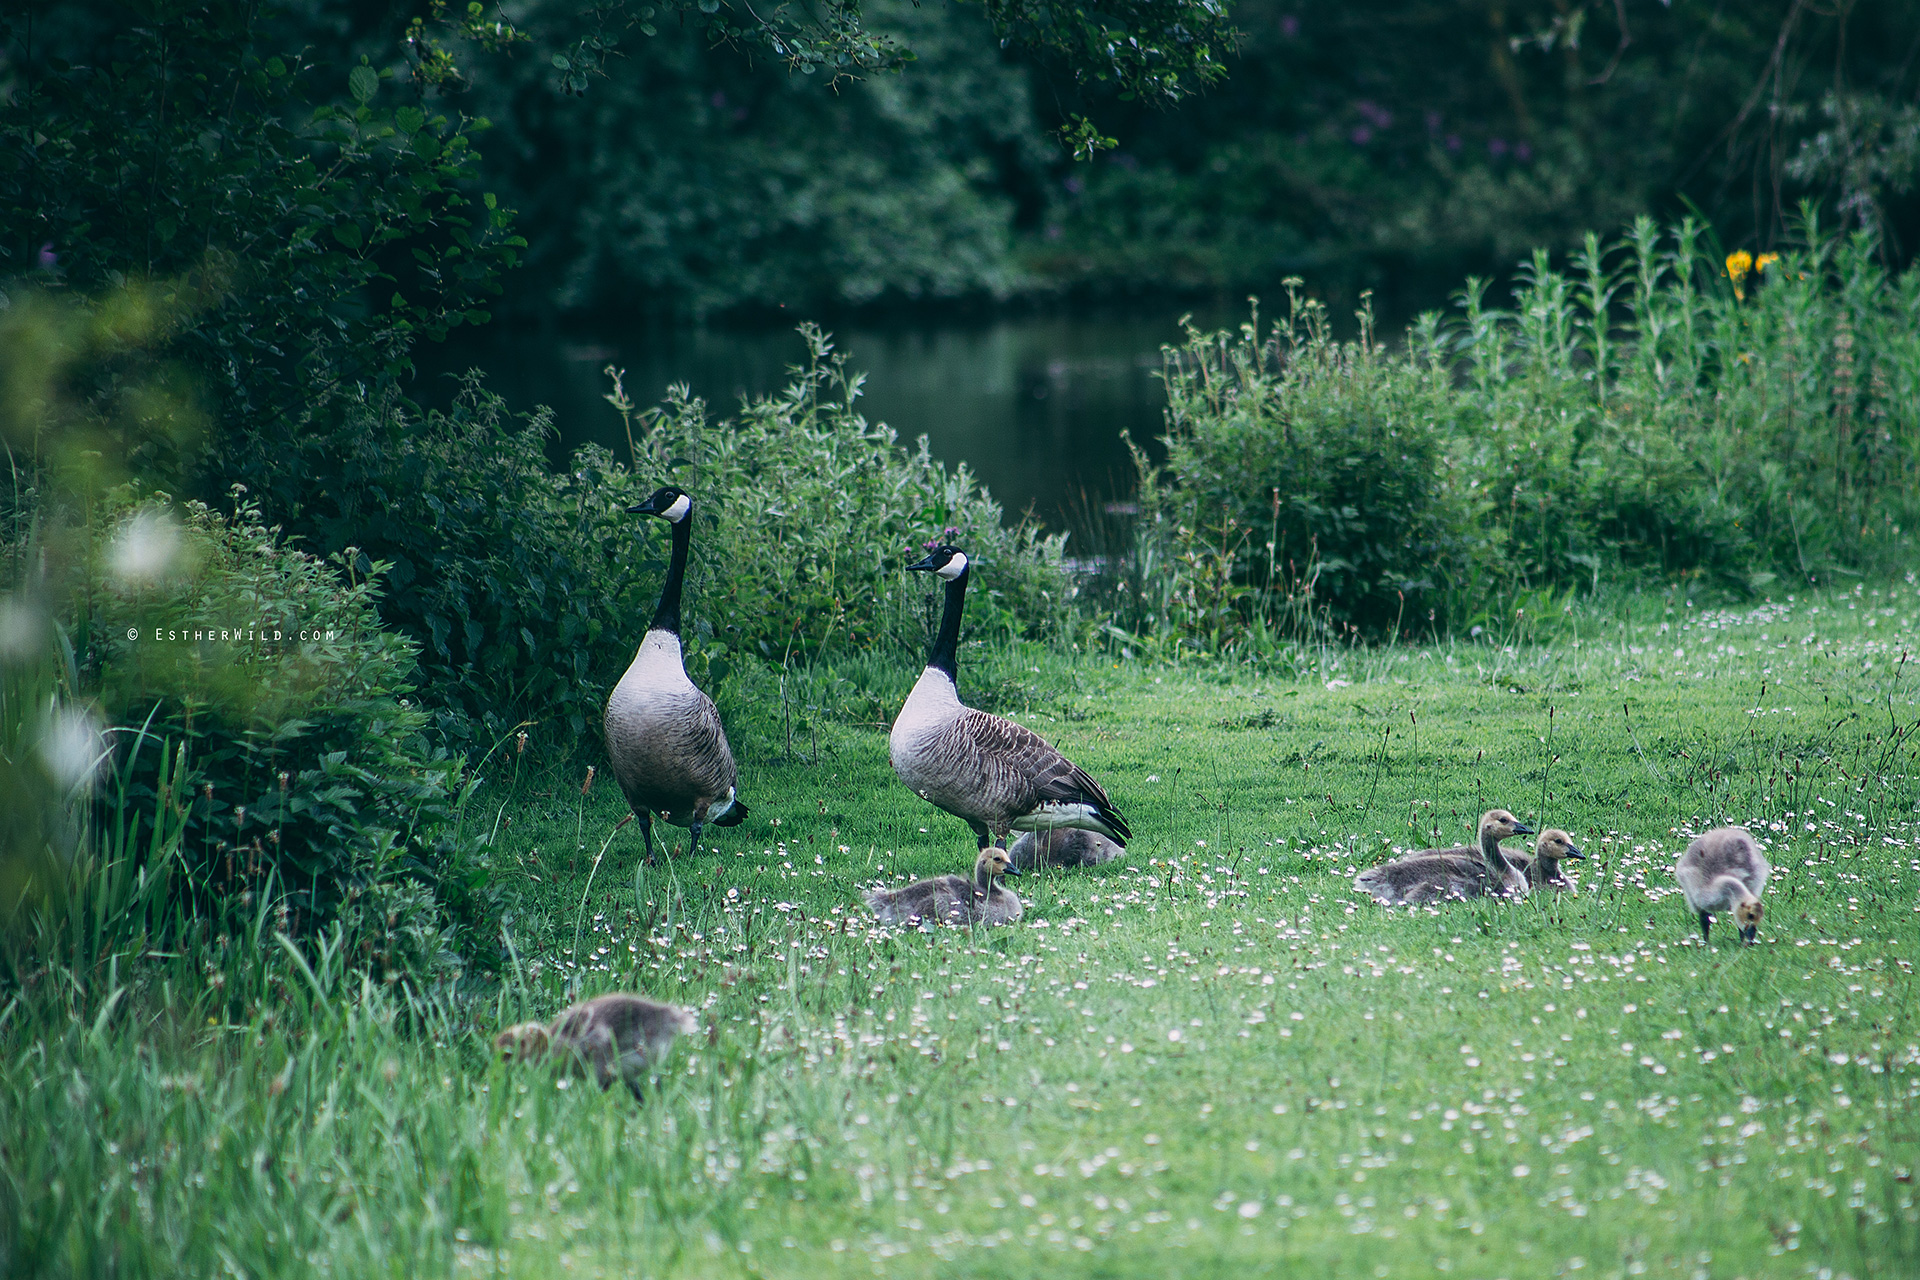 Norfolk_Wedding_Photographer_Mannington_Hall_Country_Esther_Wild_0679.jpg